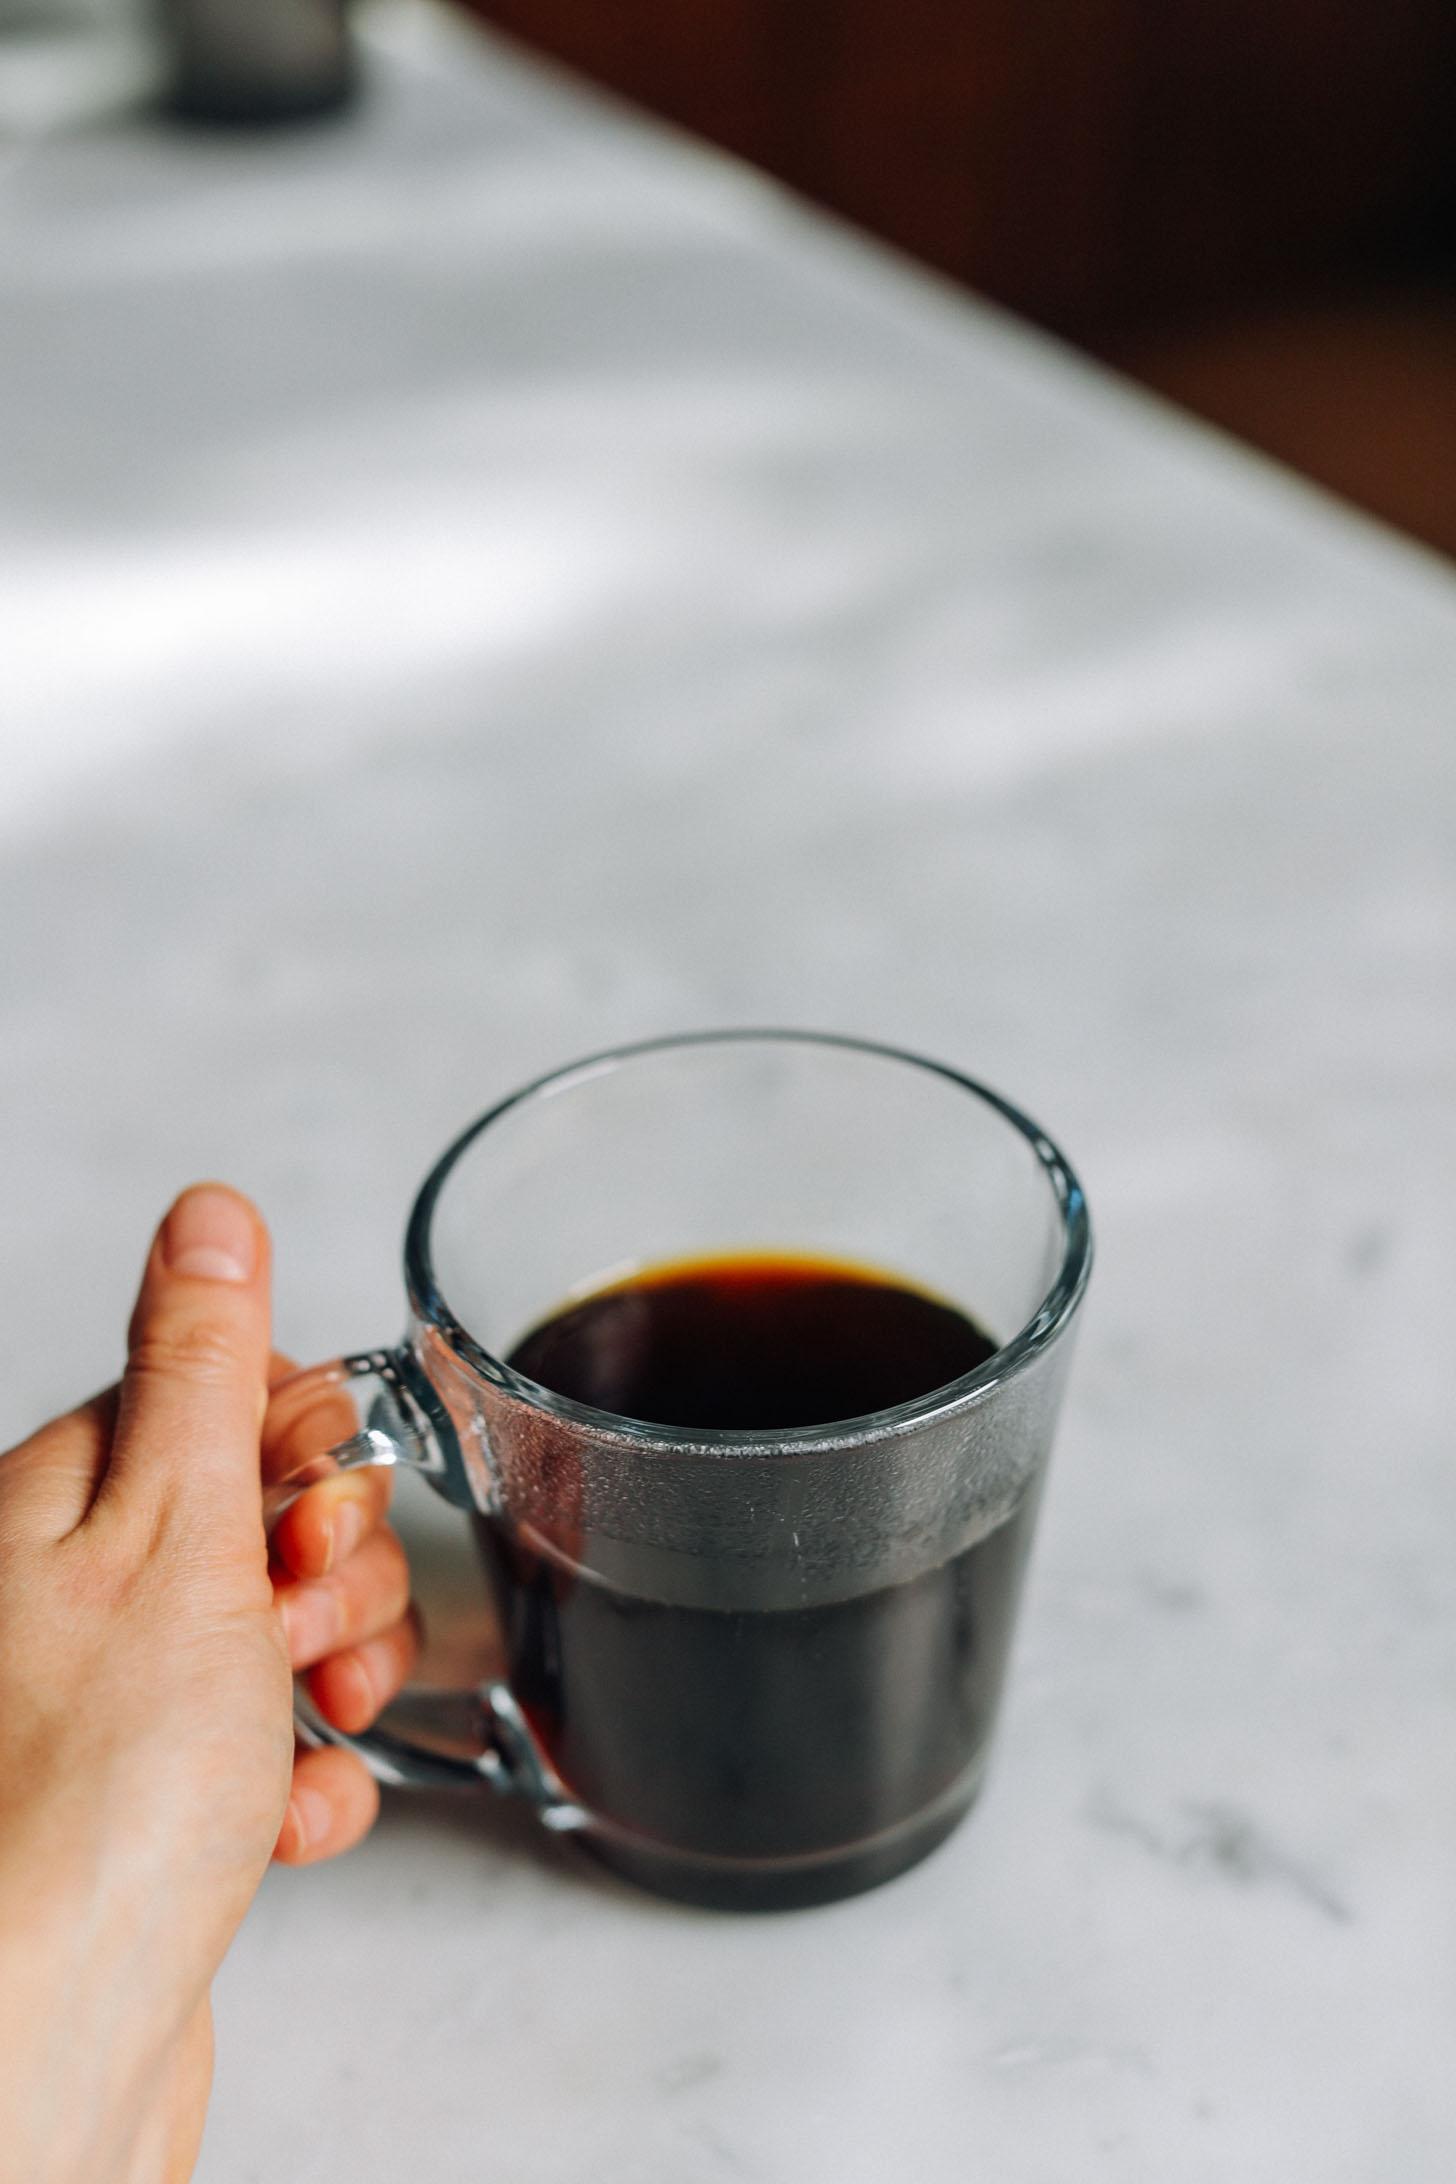 Holding the handle of a mug of coffee